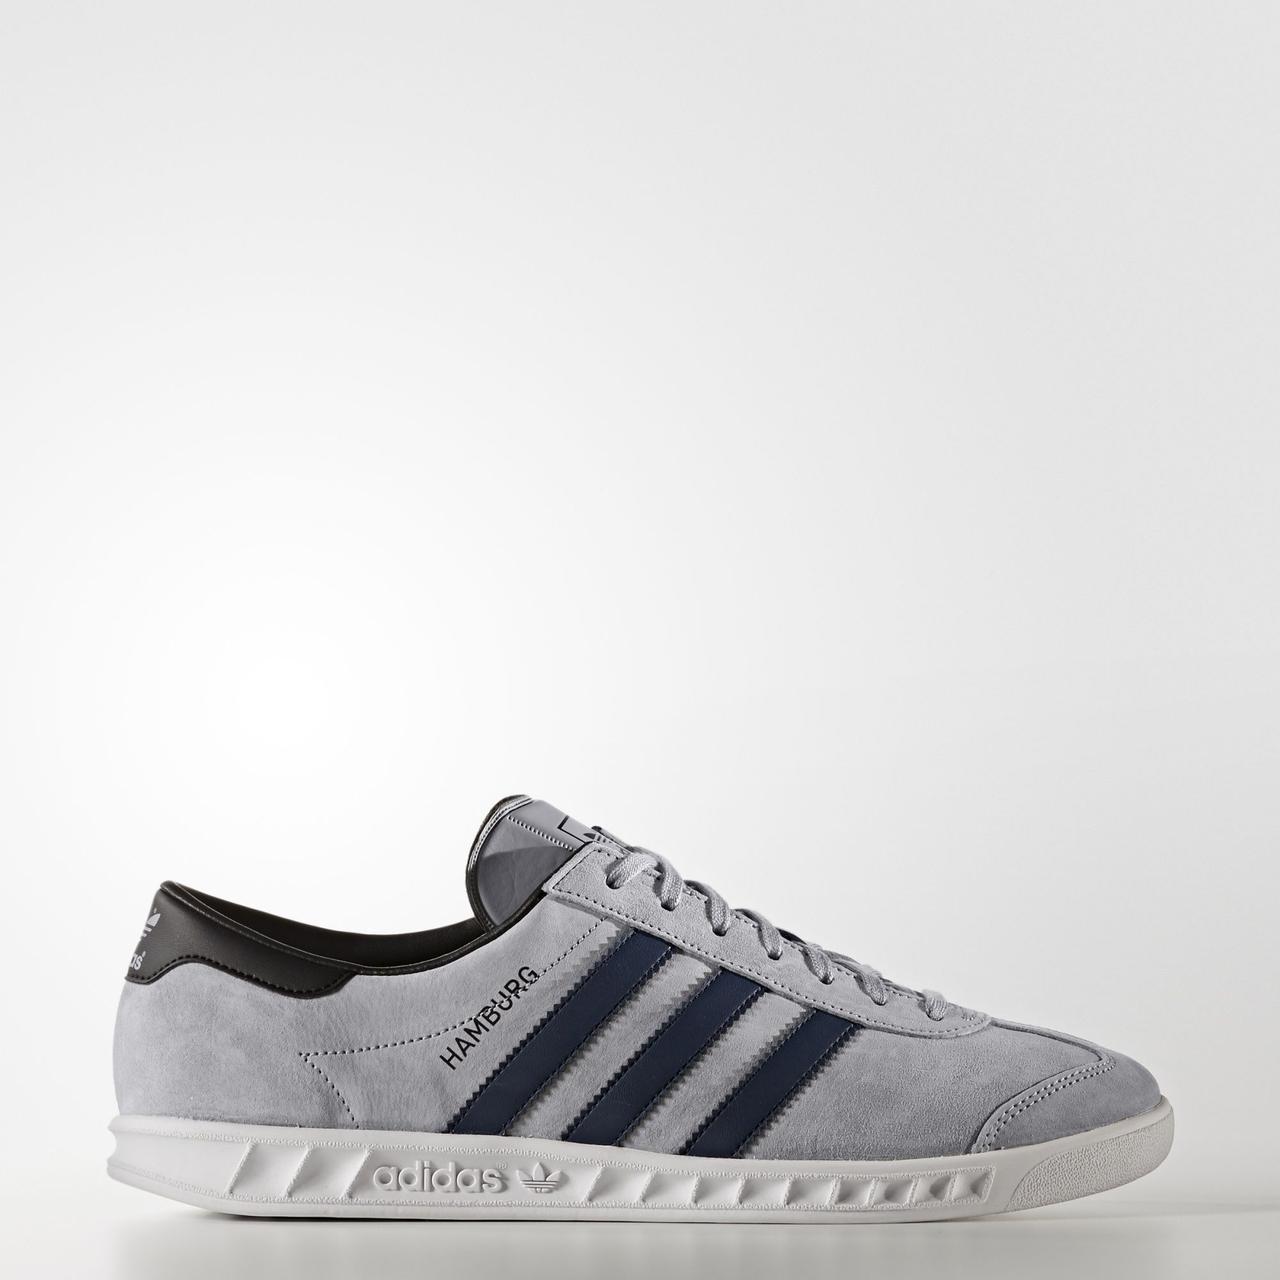 bb4601164f011c Кроссовки Adidas Hamburg